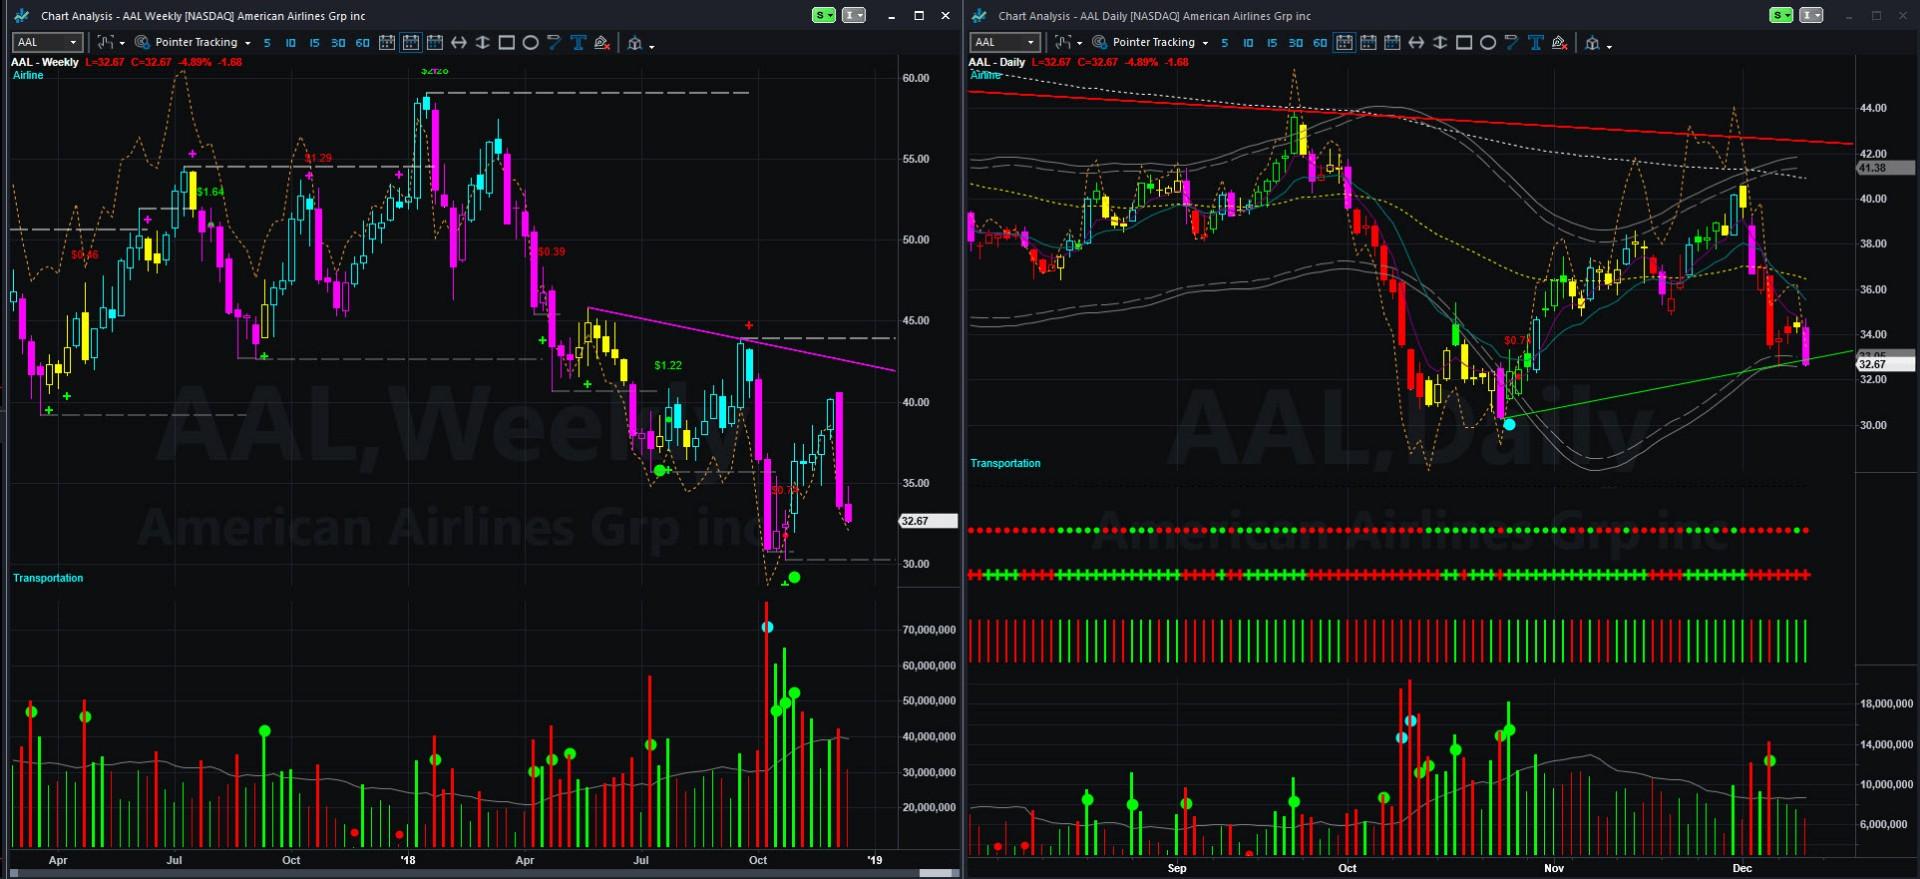 AAL CHART 2018-12-13_14-45-14.jpg